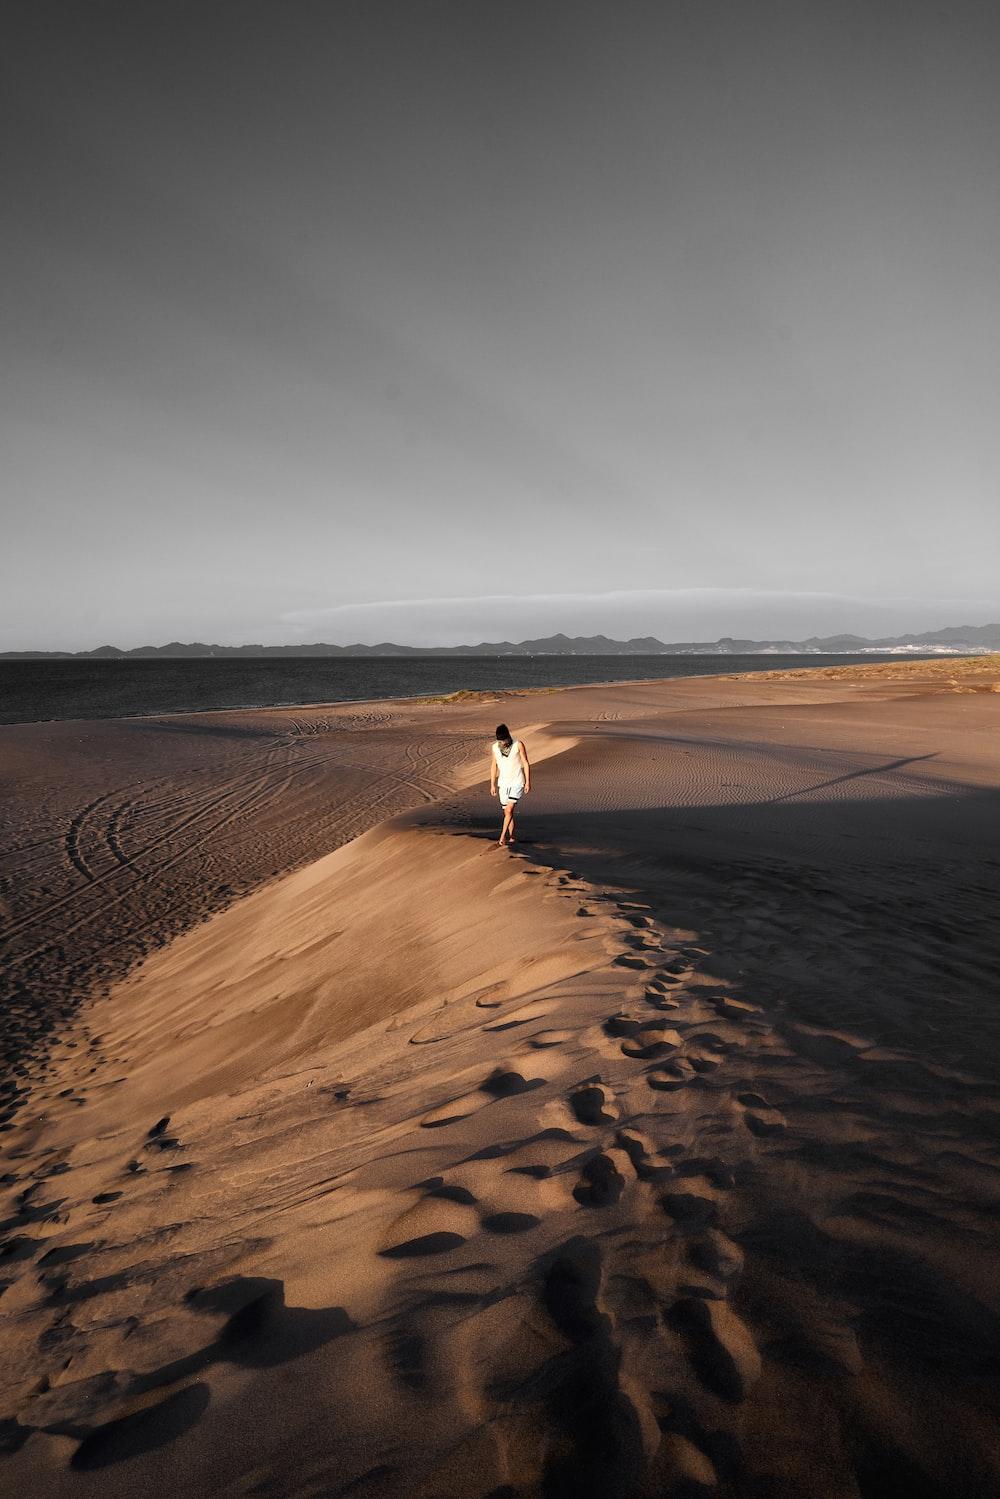 white bird on brown sand during daytime